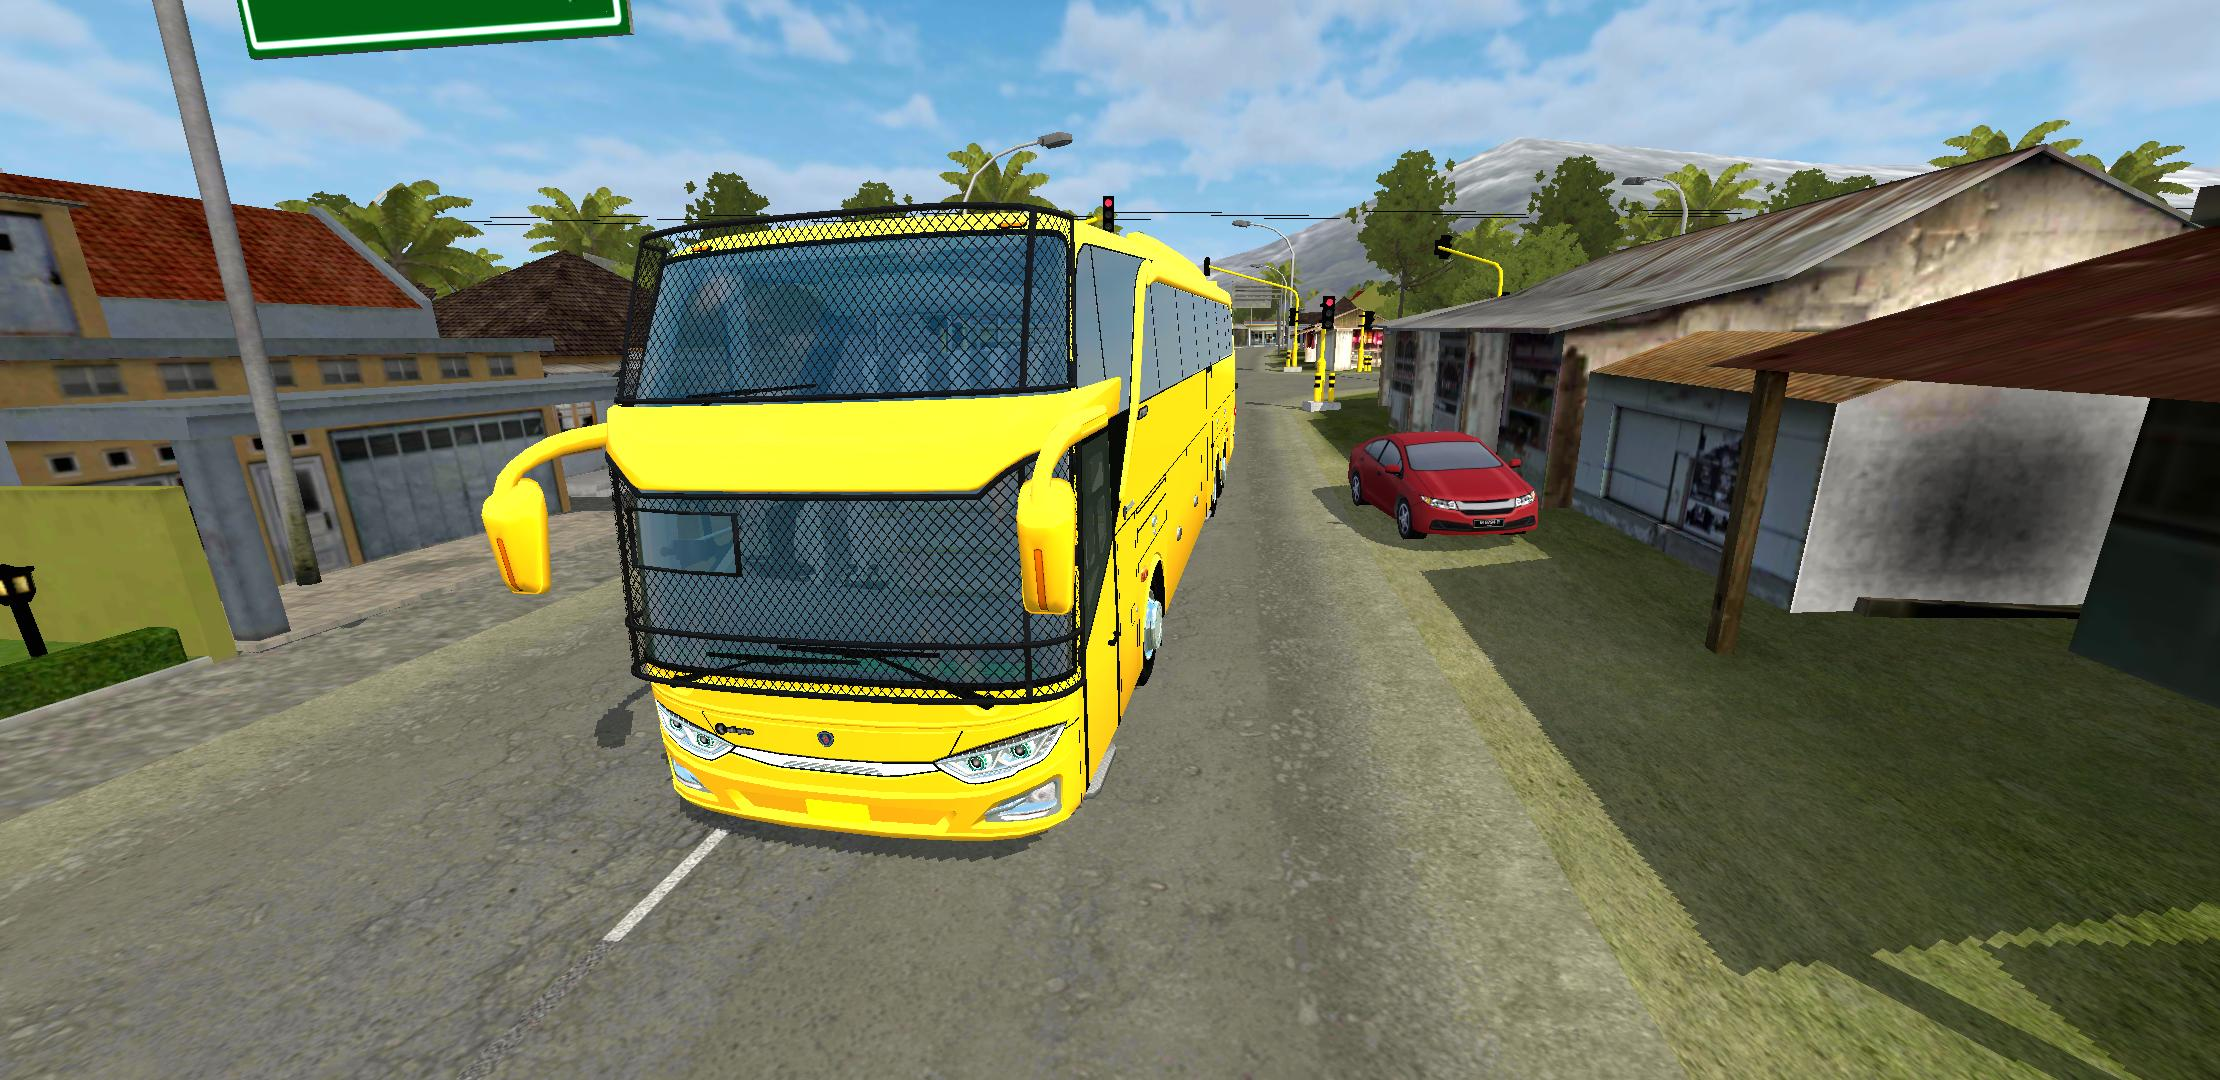 Bus Simulator Indonésia: Mod JB3 Scania K410iB (Download)